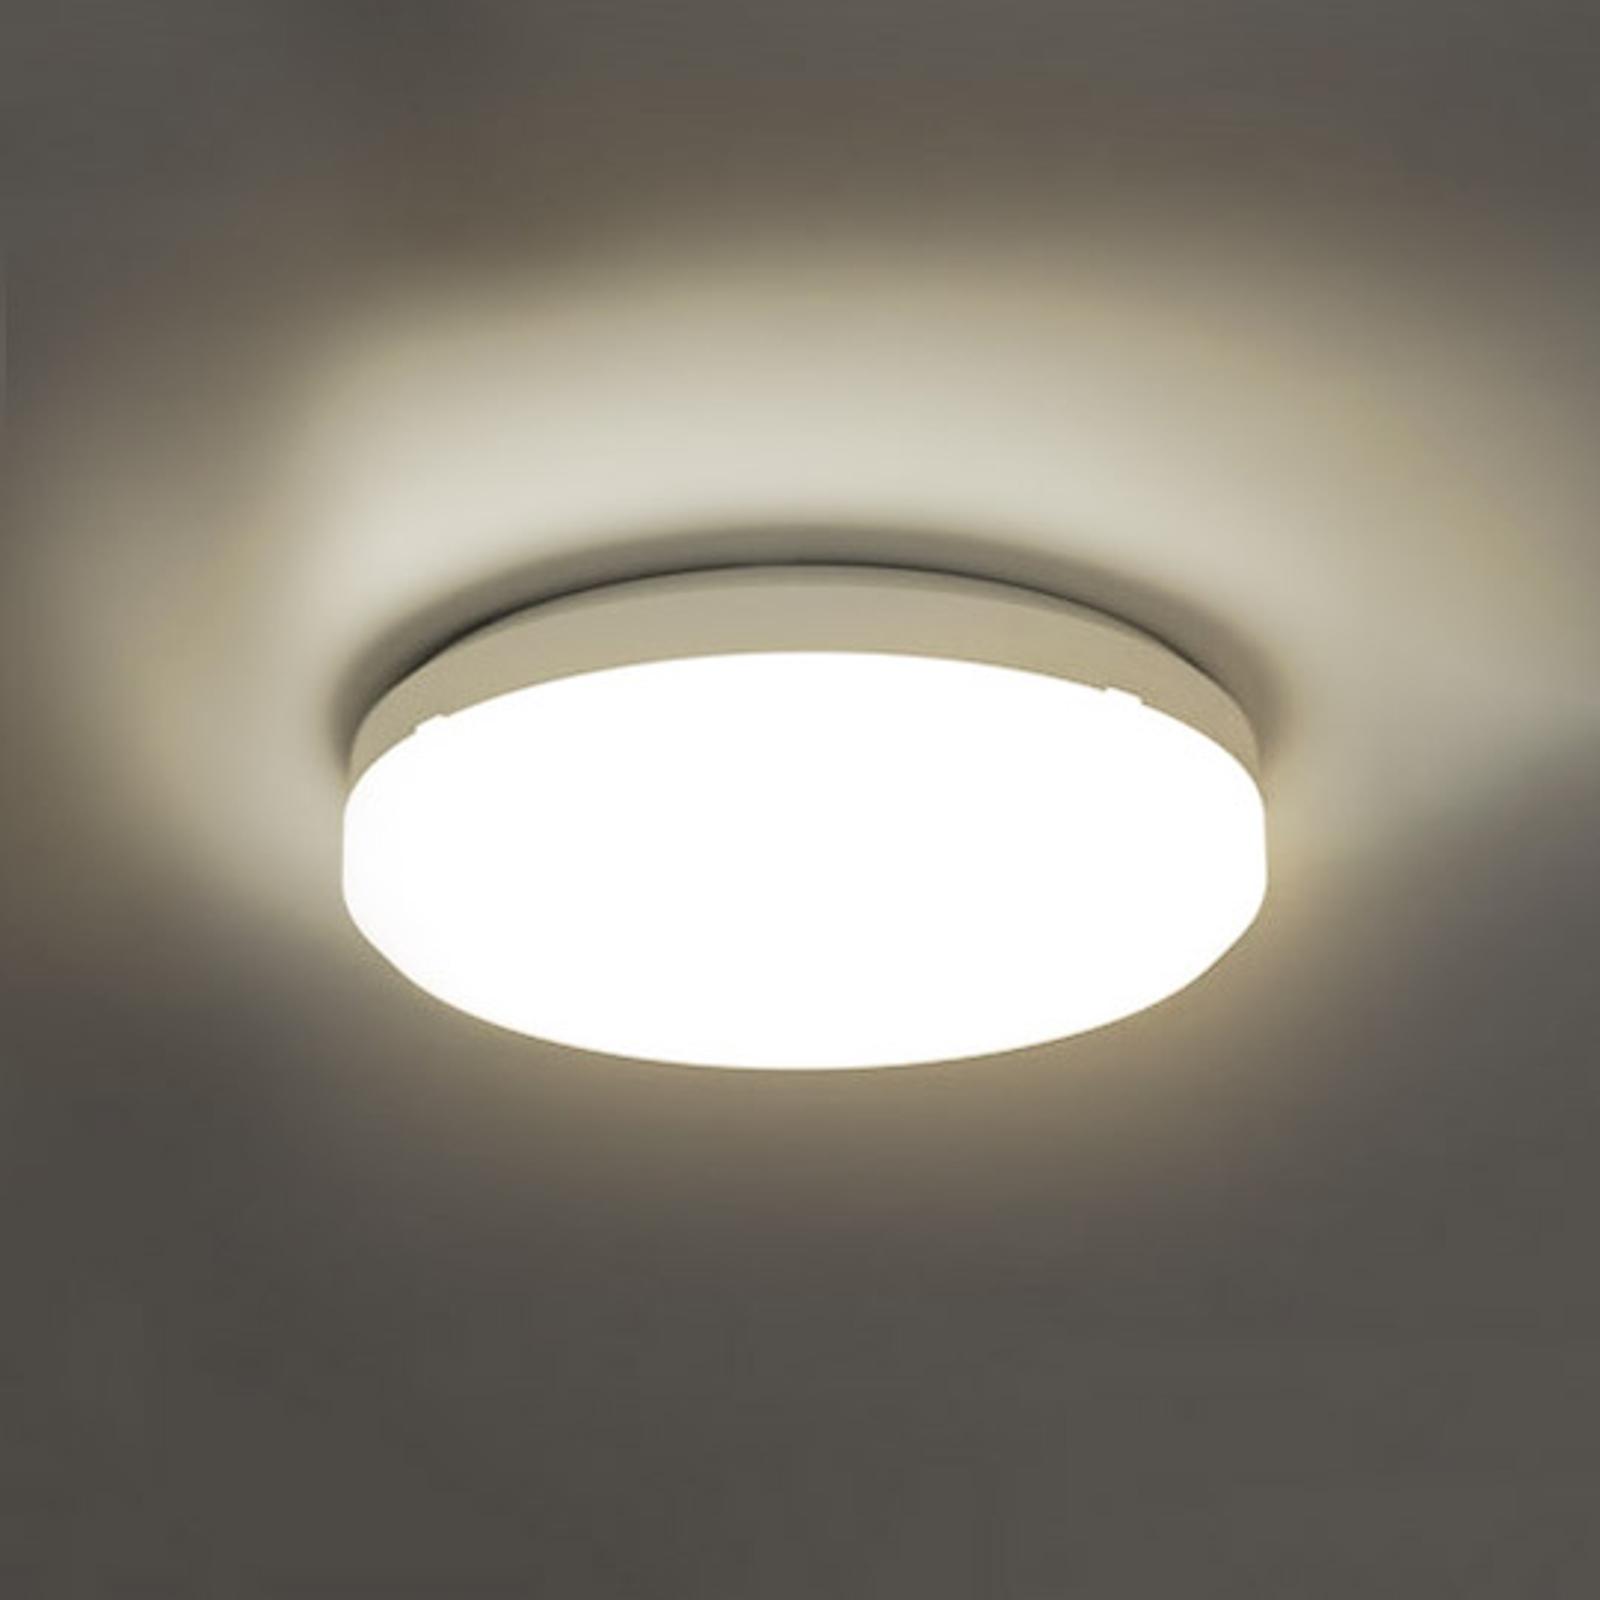 SUN 15, led-plafondlamp IP65, 18W, 3000 K,warmwit